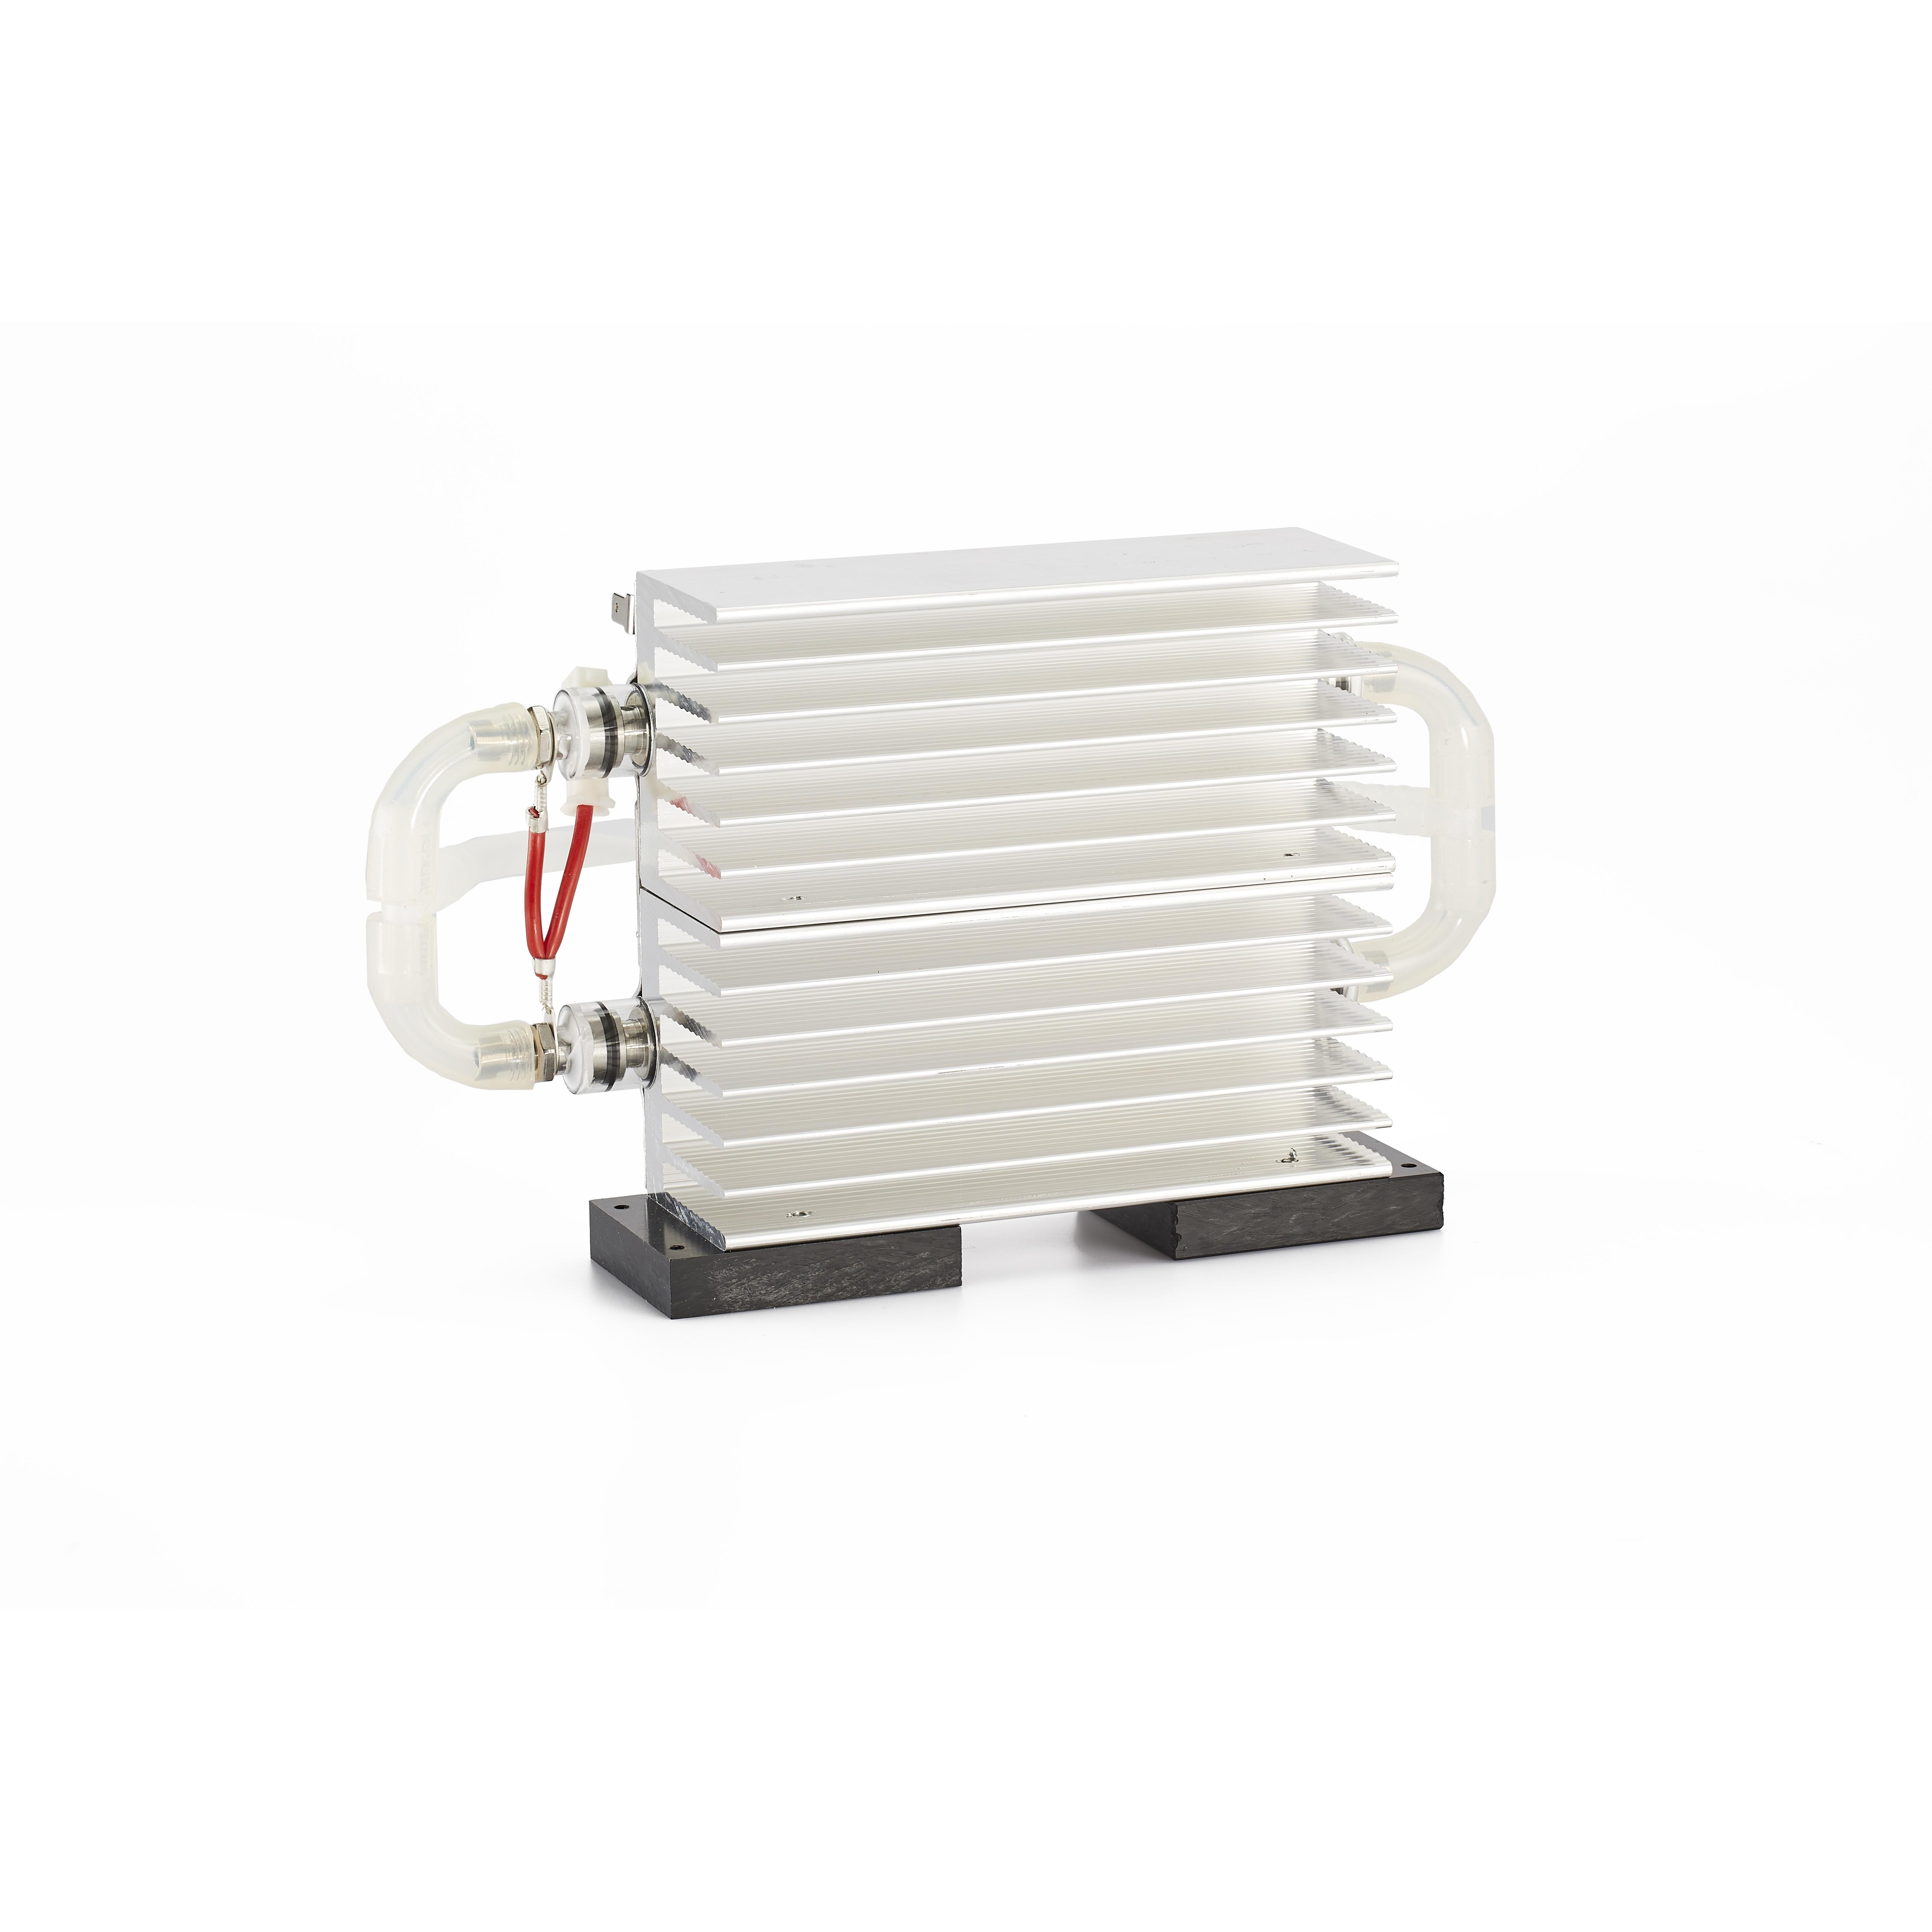 Wood's® Elektroden Keramikrohr  Airmaster WOZ 4000